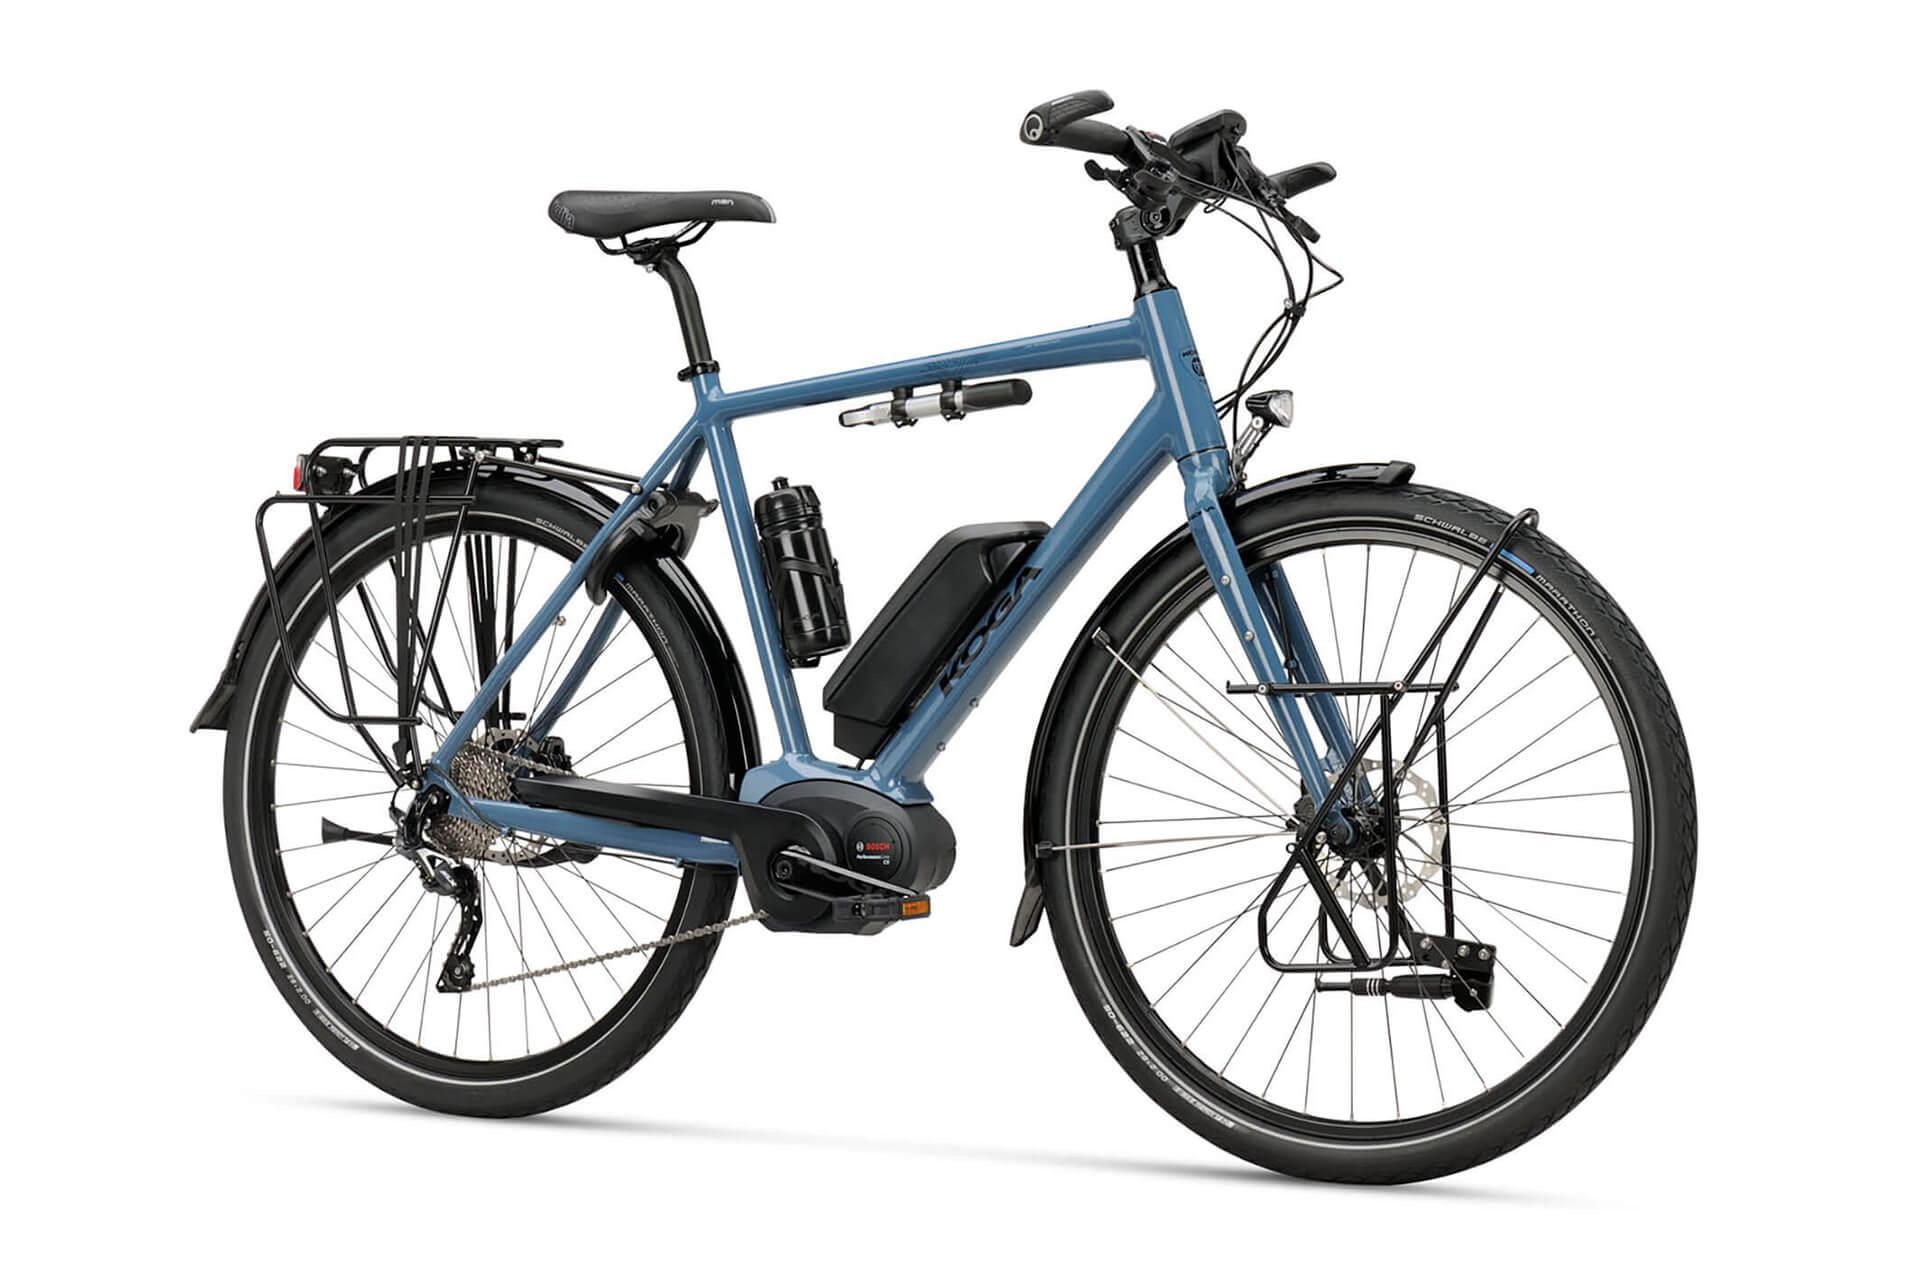 Koga worldtraveller fietsen Jurgen